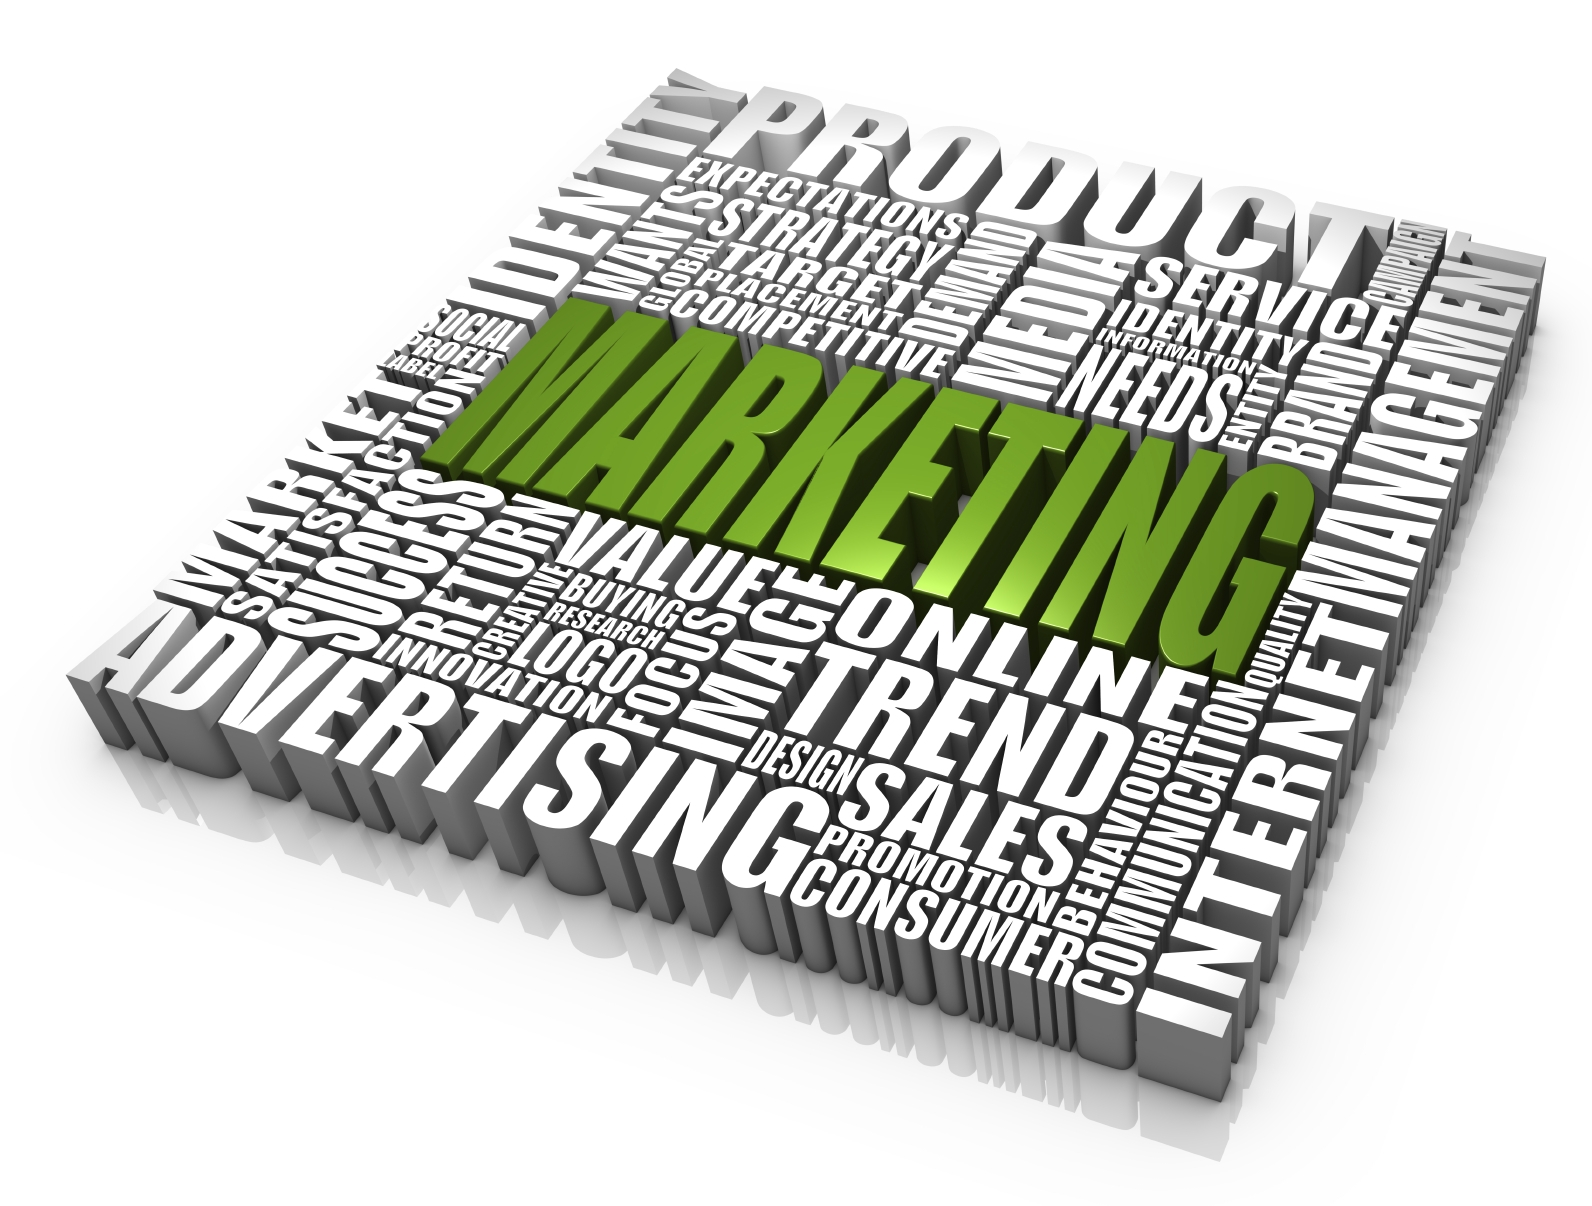 Dental practice marketing advice